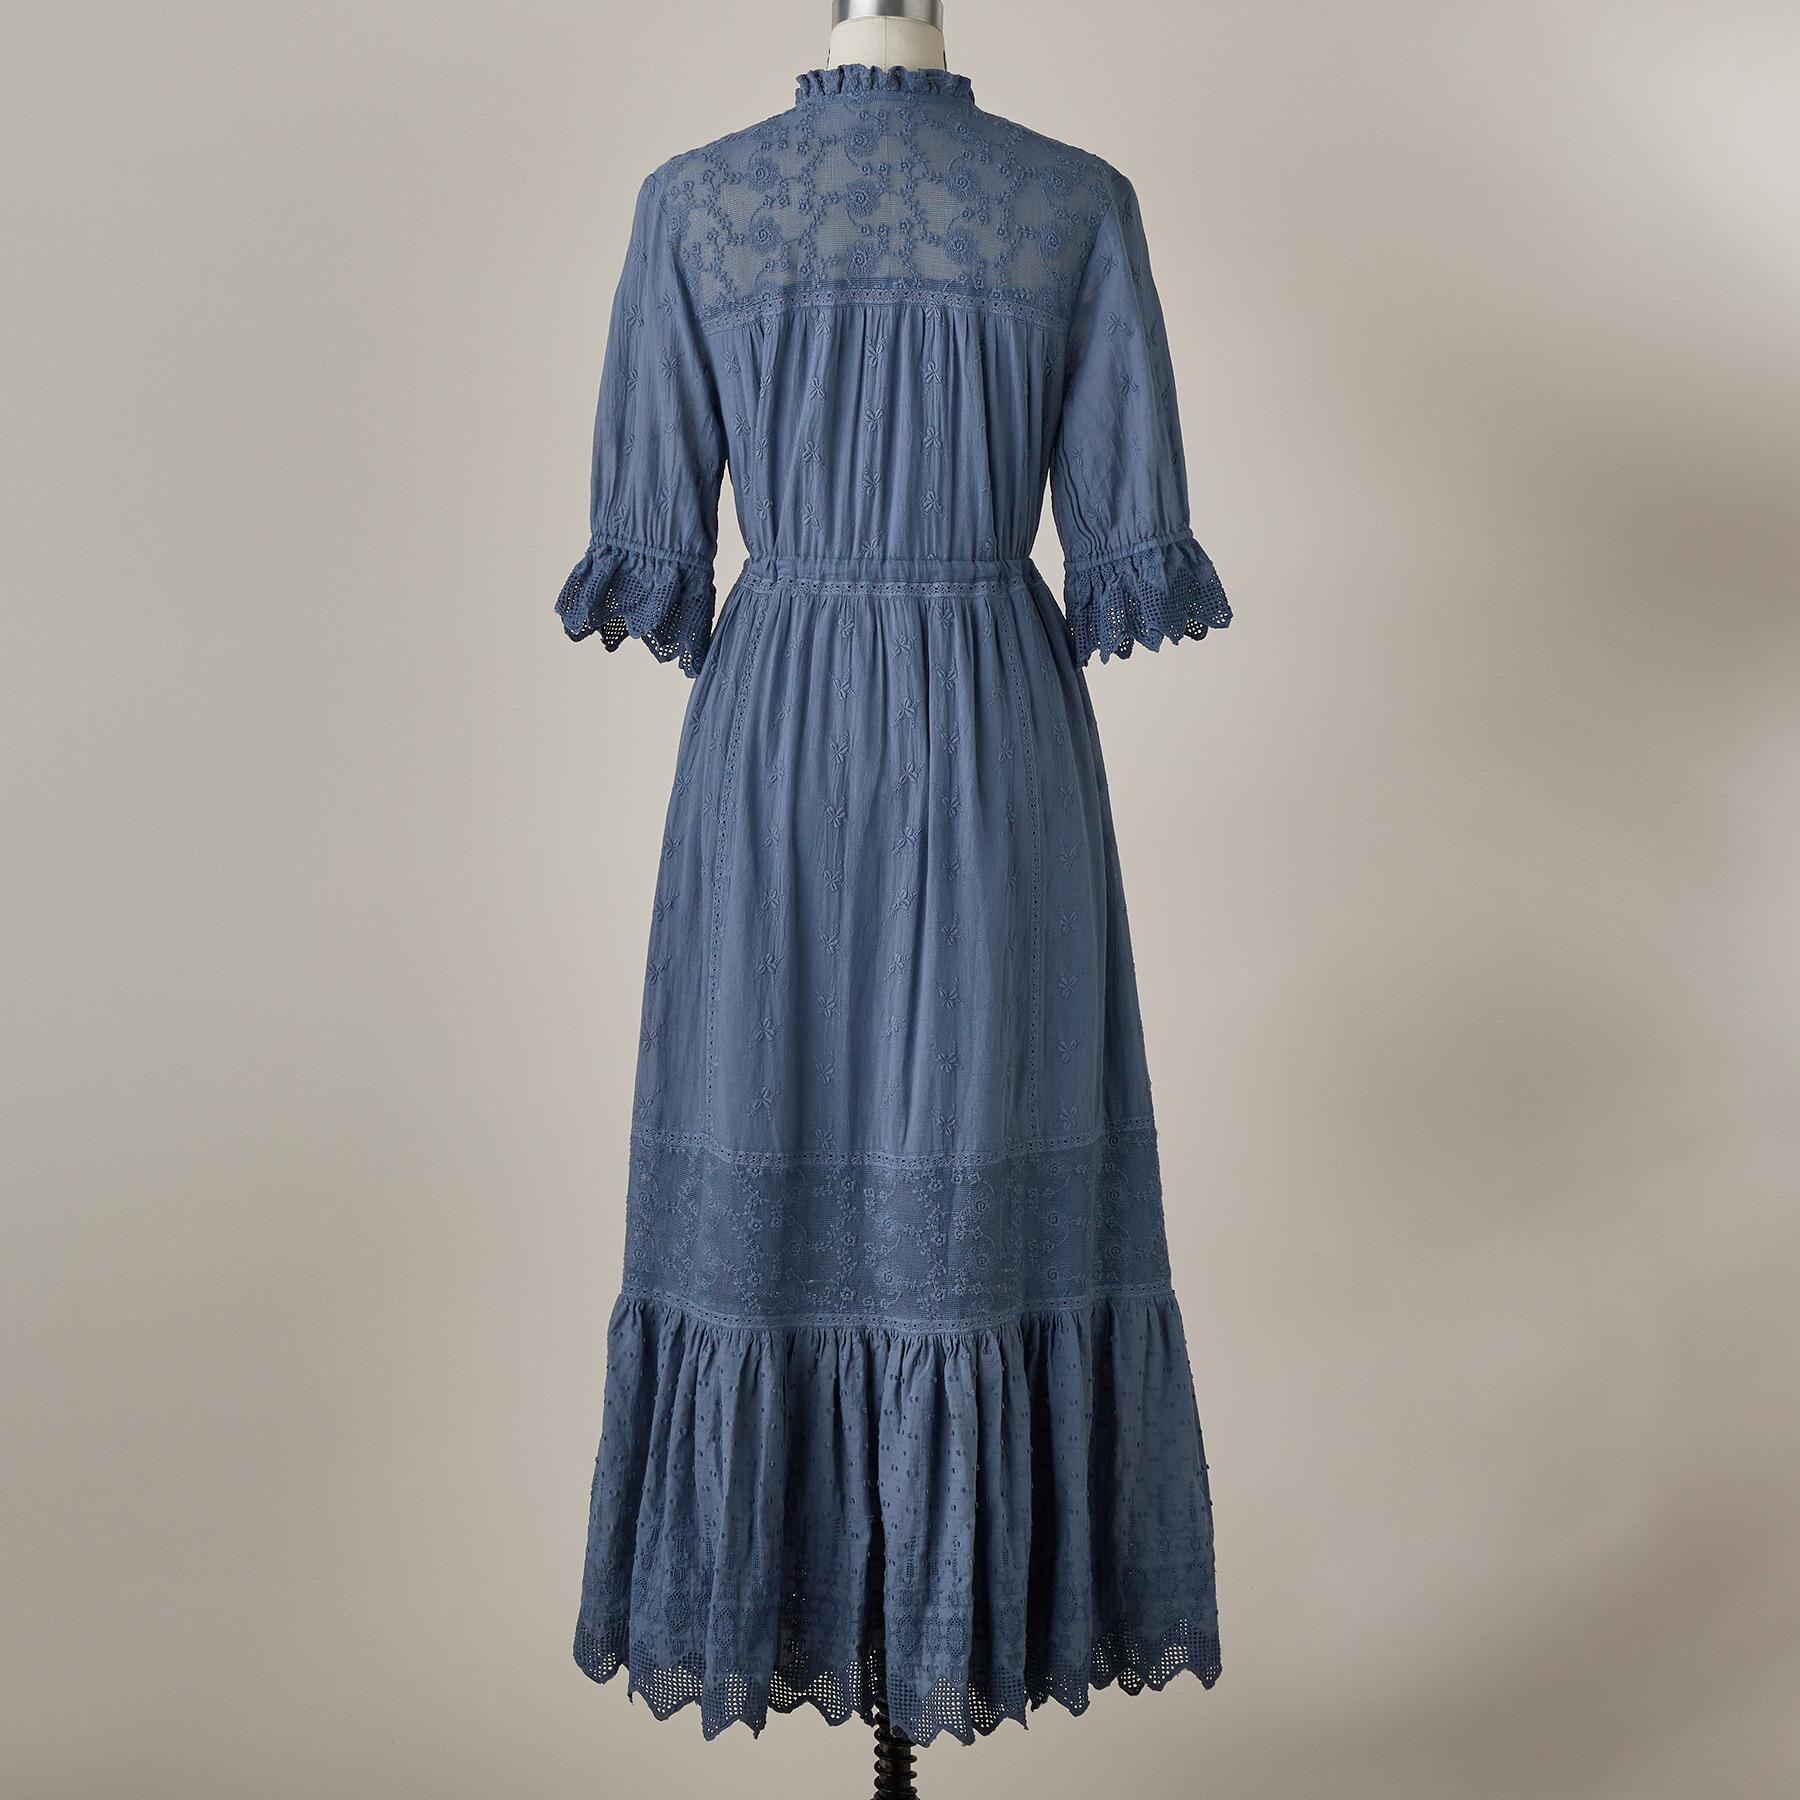 RALEINE DRESS PETITE: View 3